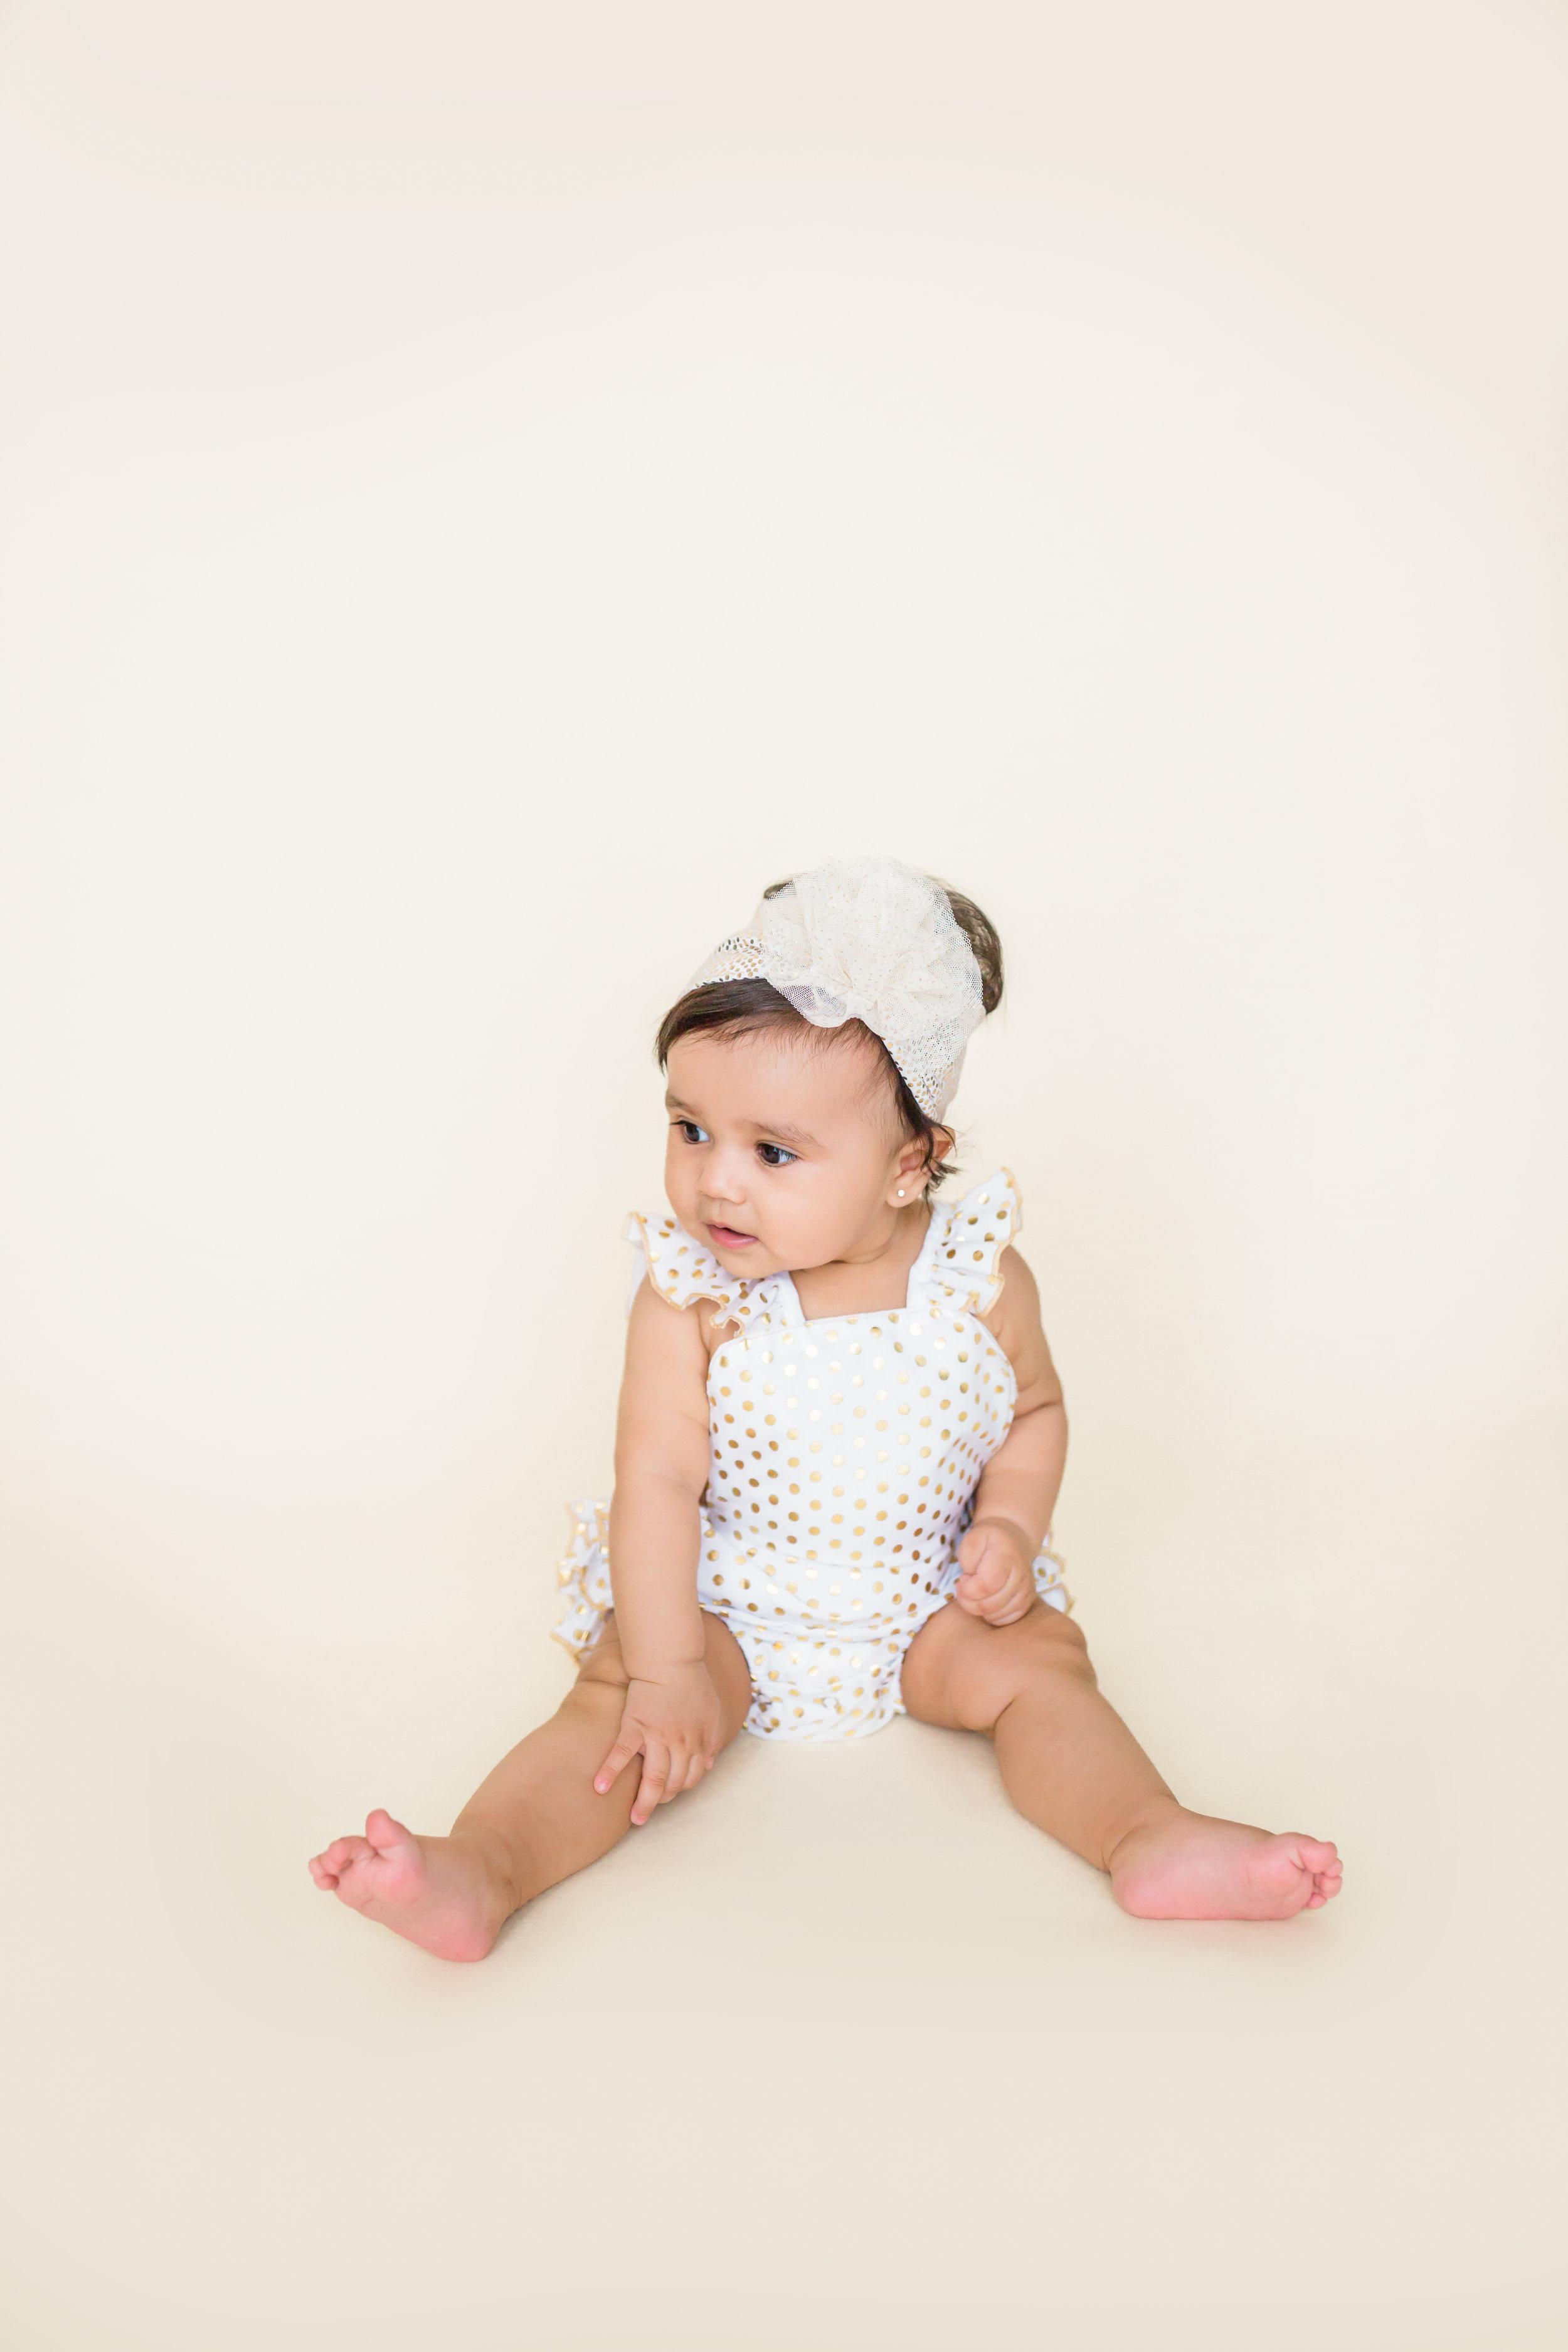 Sophia s 6 Month Session-Sophia-0014.jpg